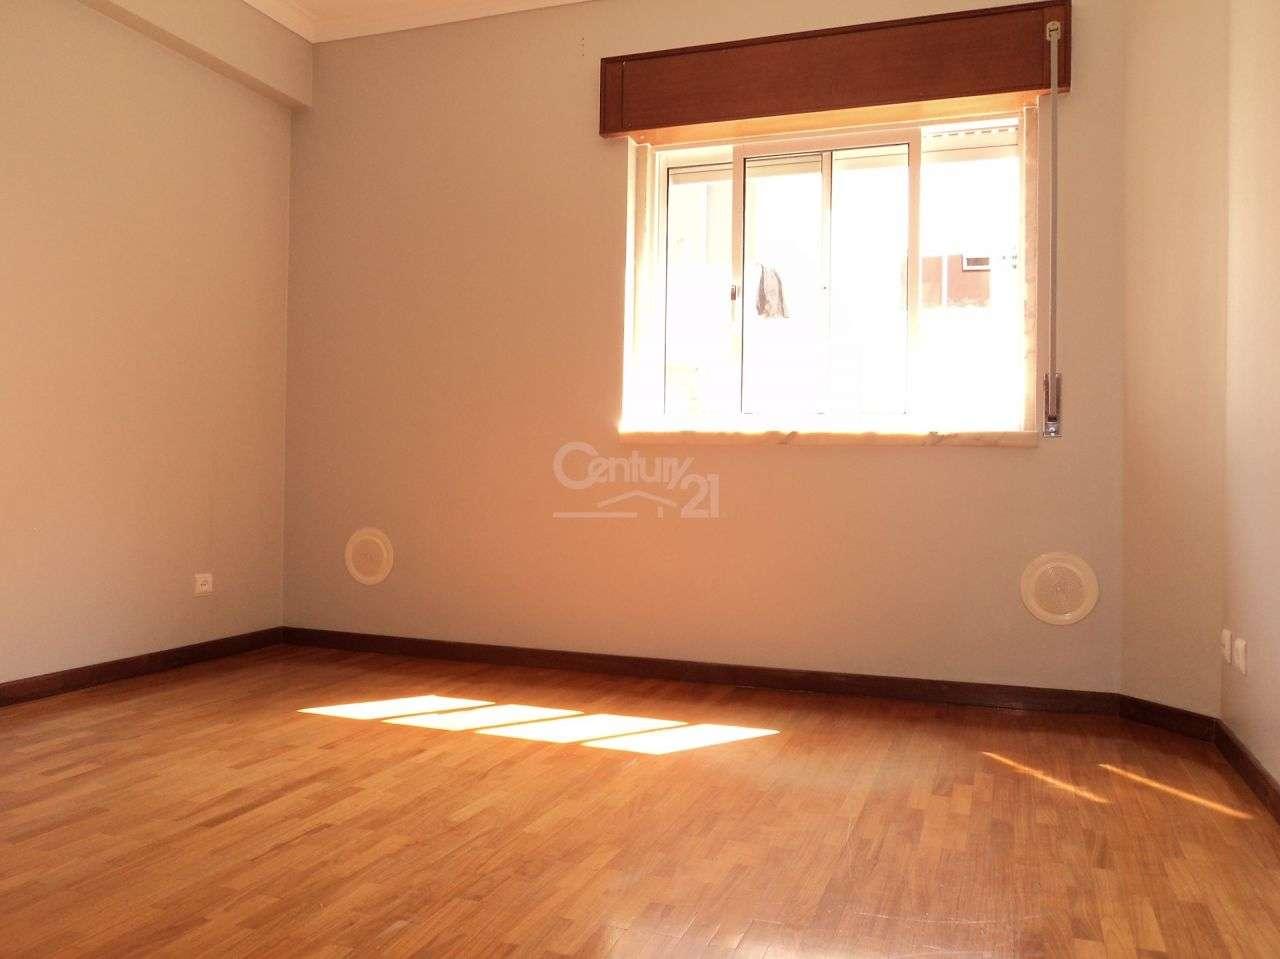 Apartamento para arrendar, Barcarena, Lisboa - Foto 7